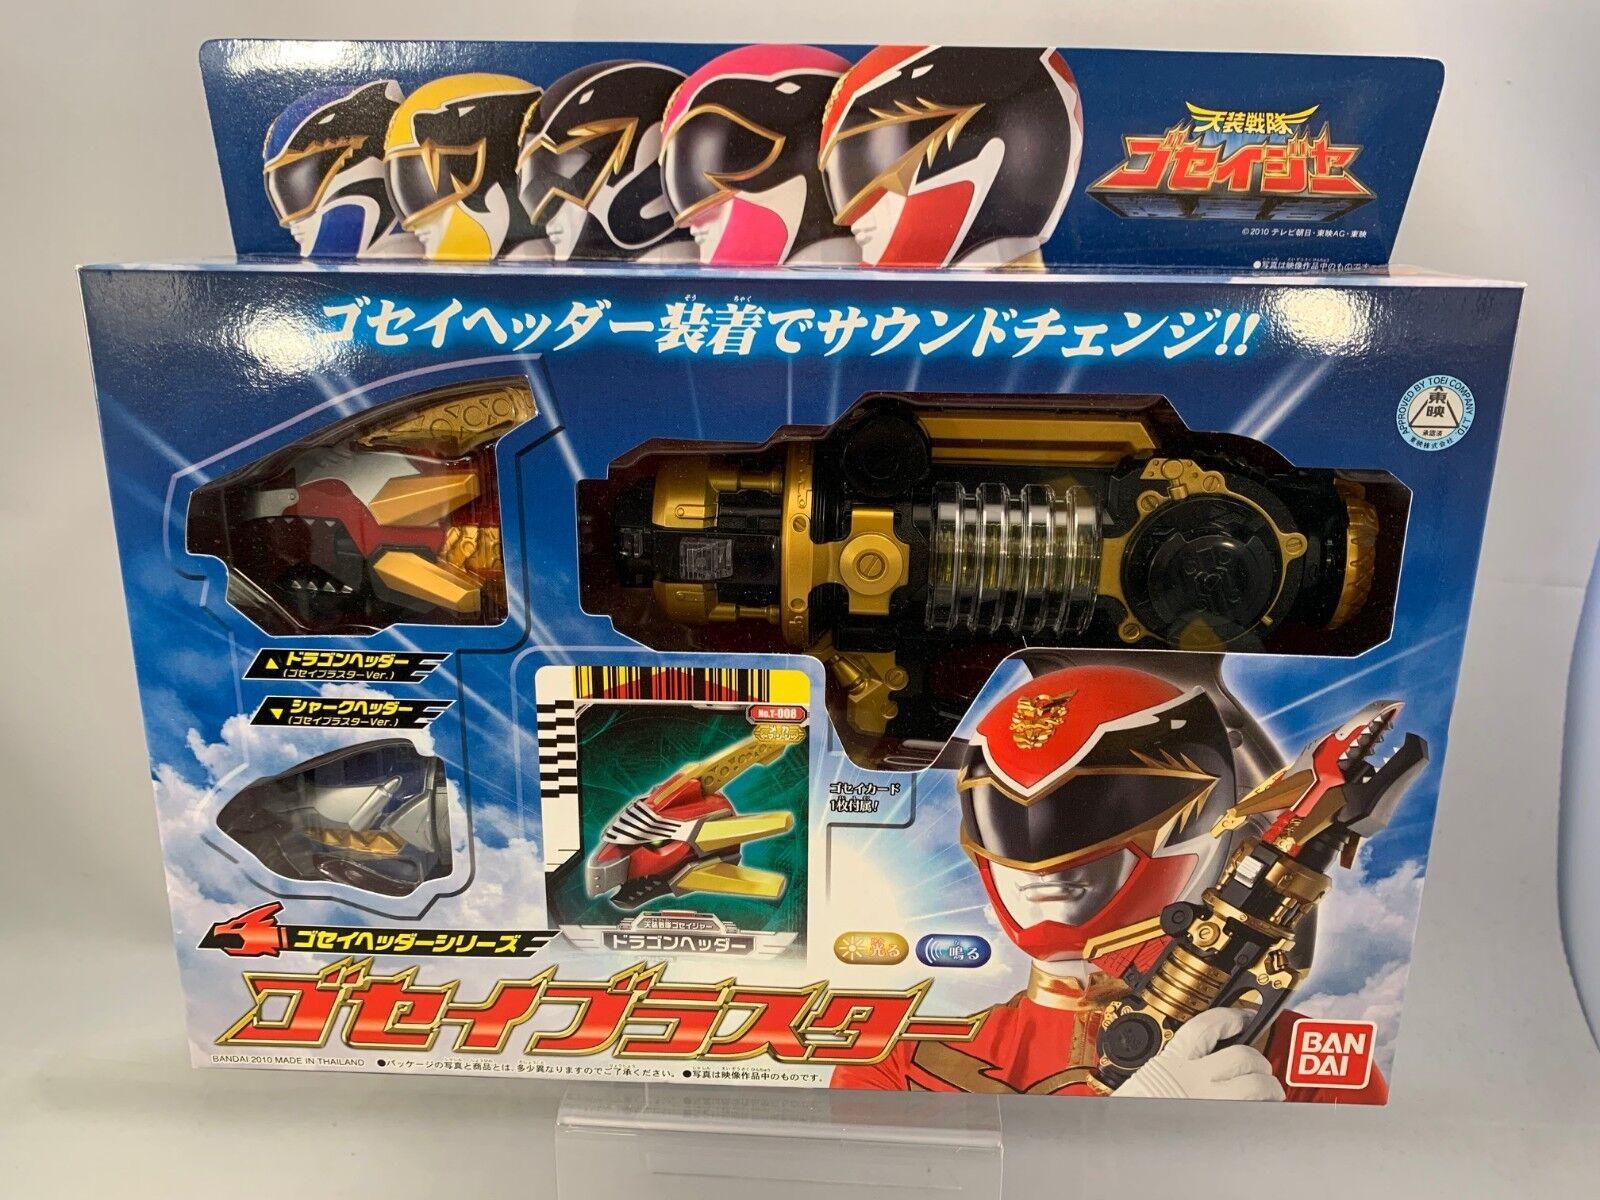 Bandai Power Rangers Tensou SENTAI GOSEIGER GOSEI Blaster 2010 Menta en caja sellada Sellado